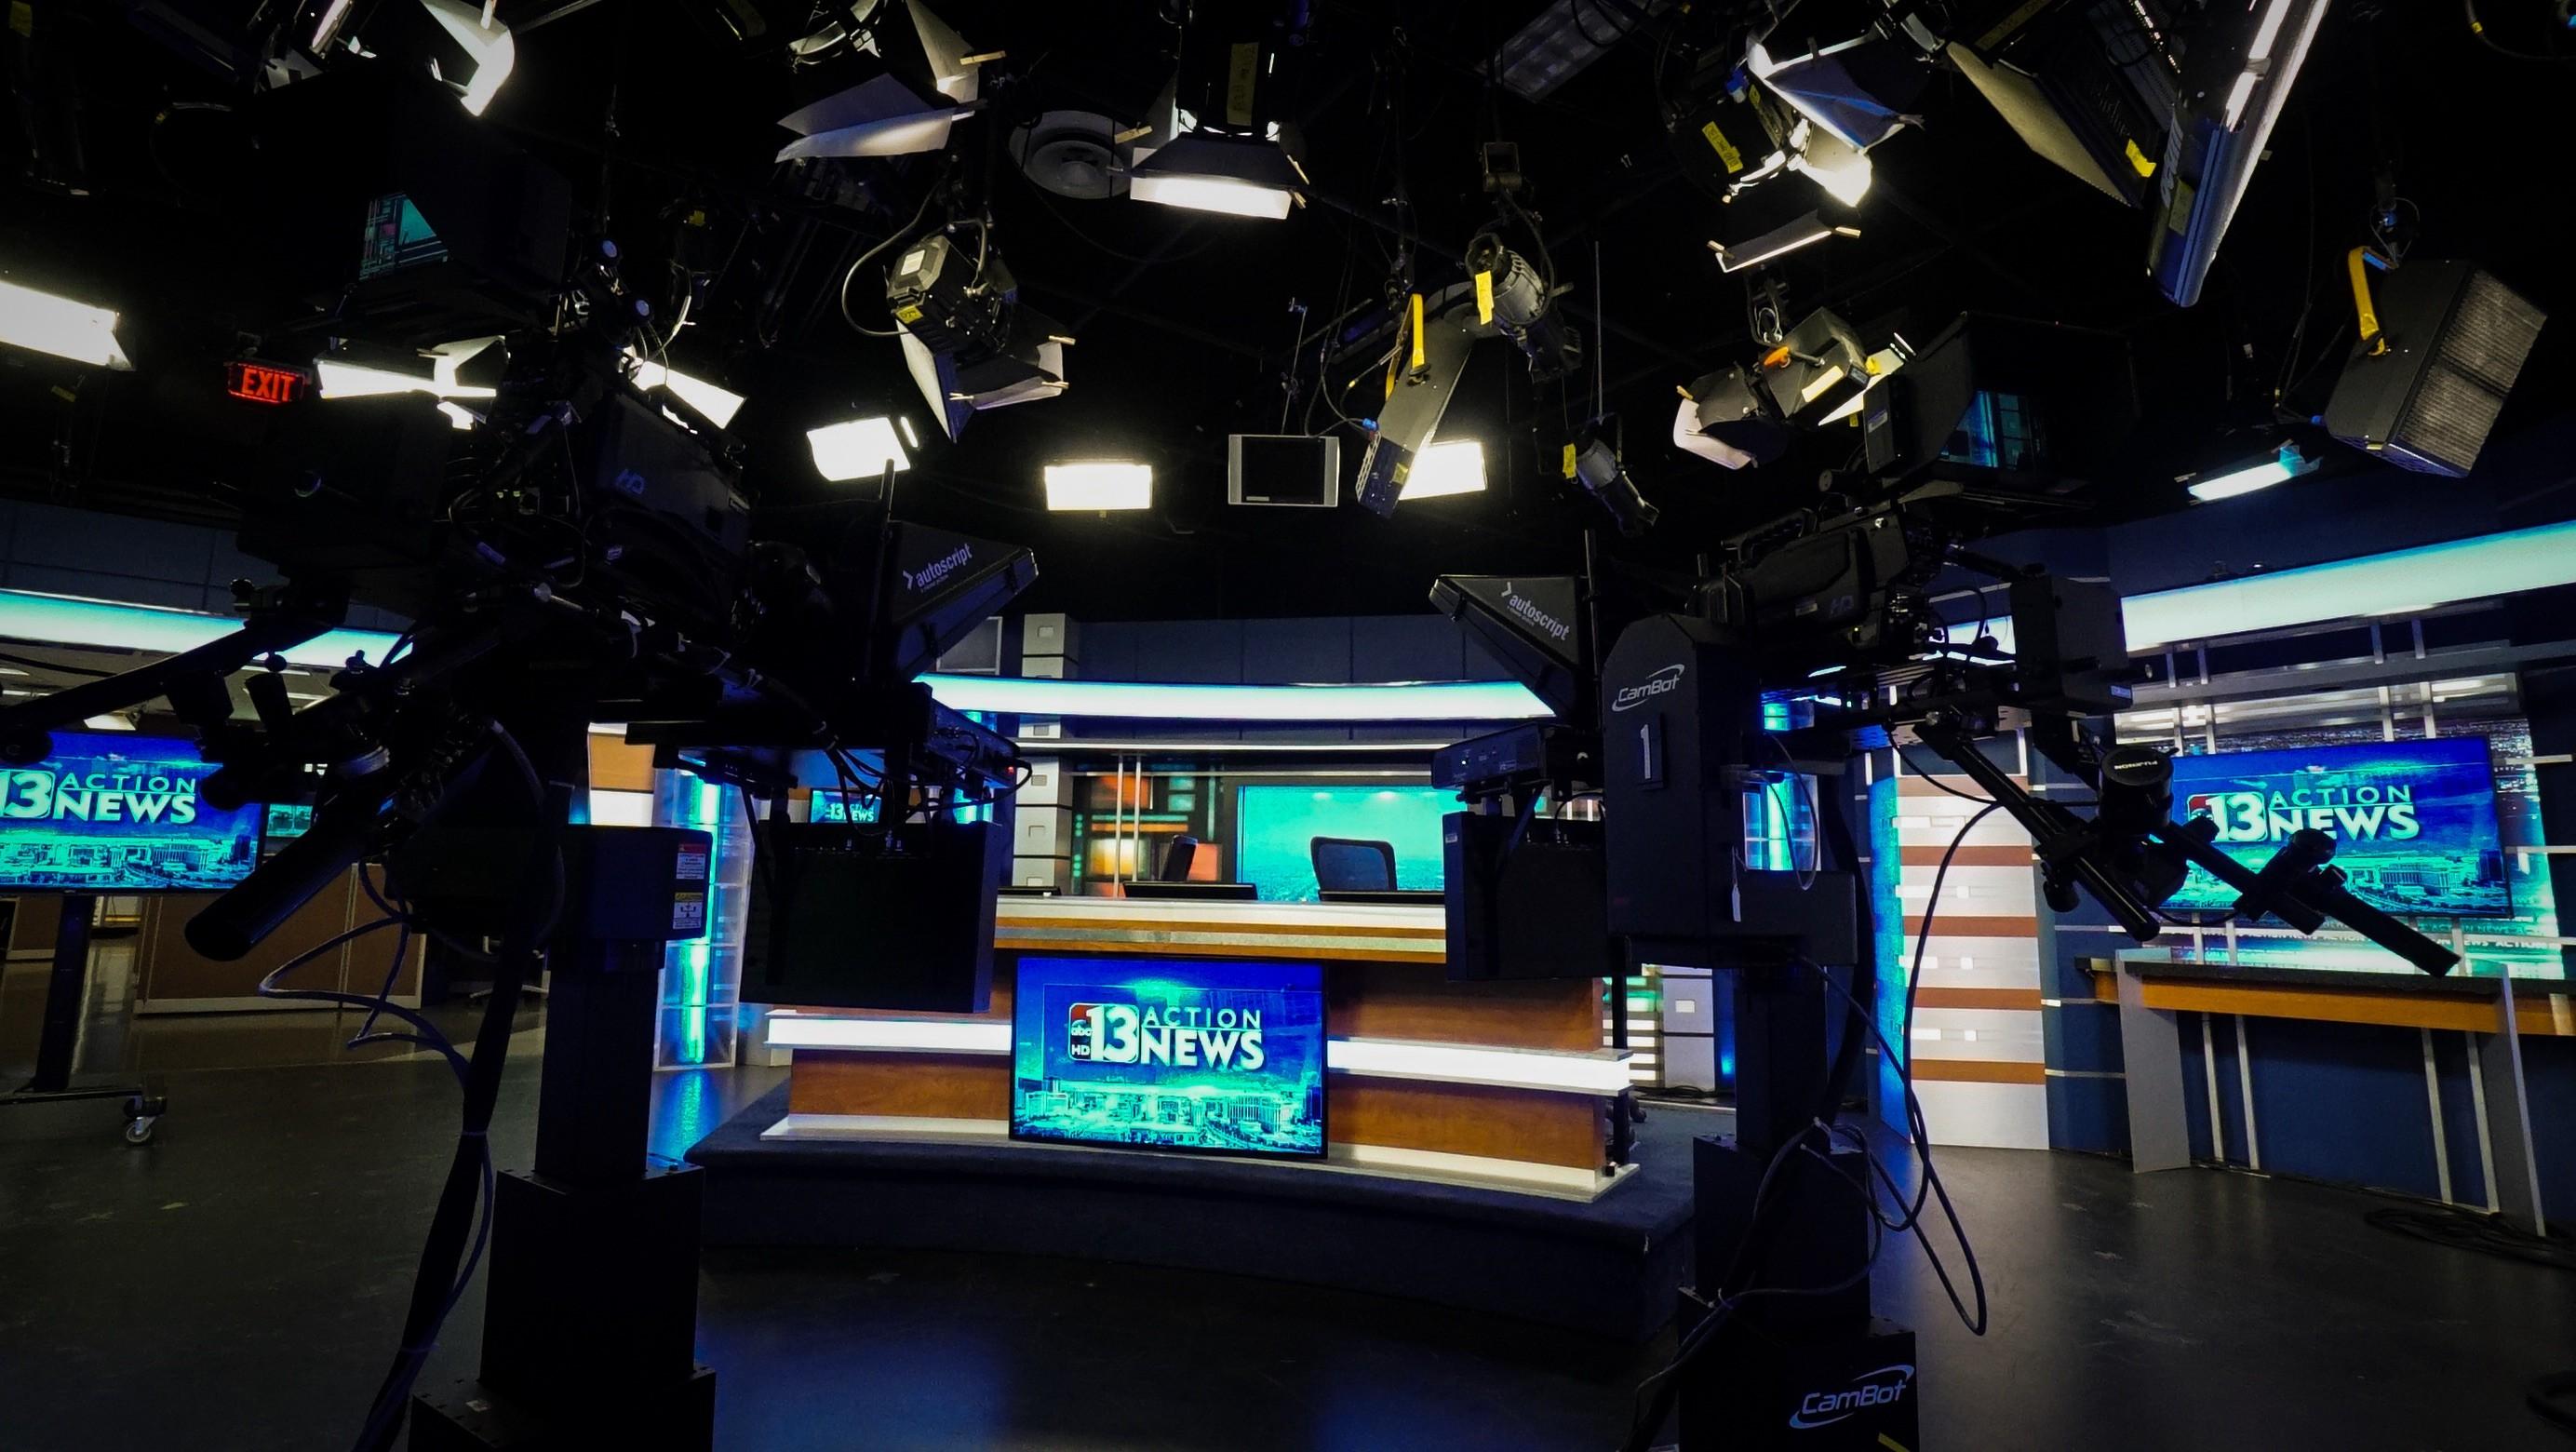 KTNV Channel 13 Action News | LinkedIn